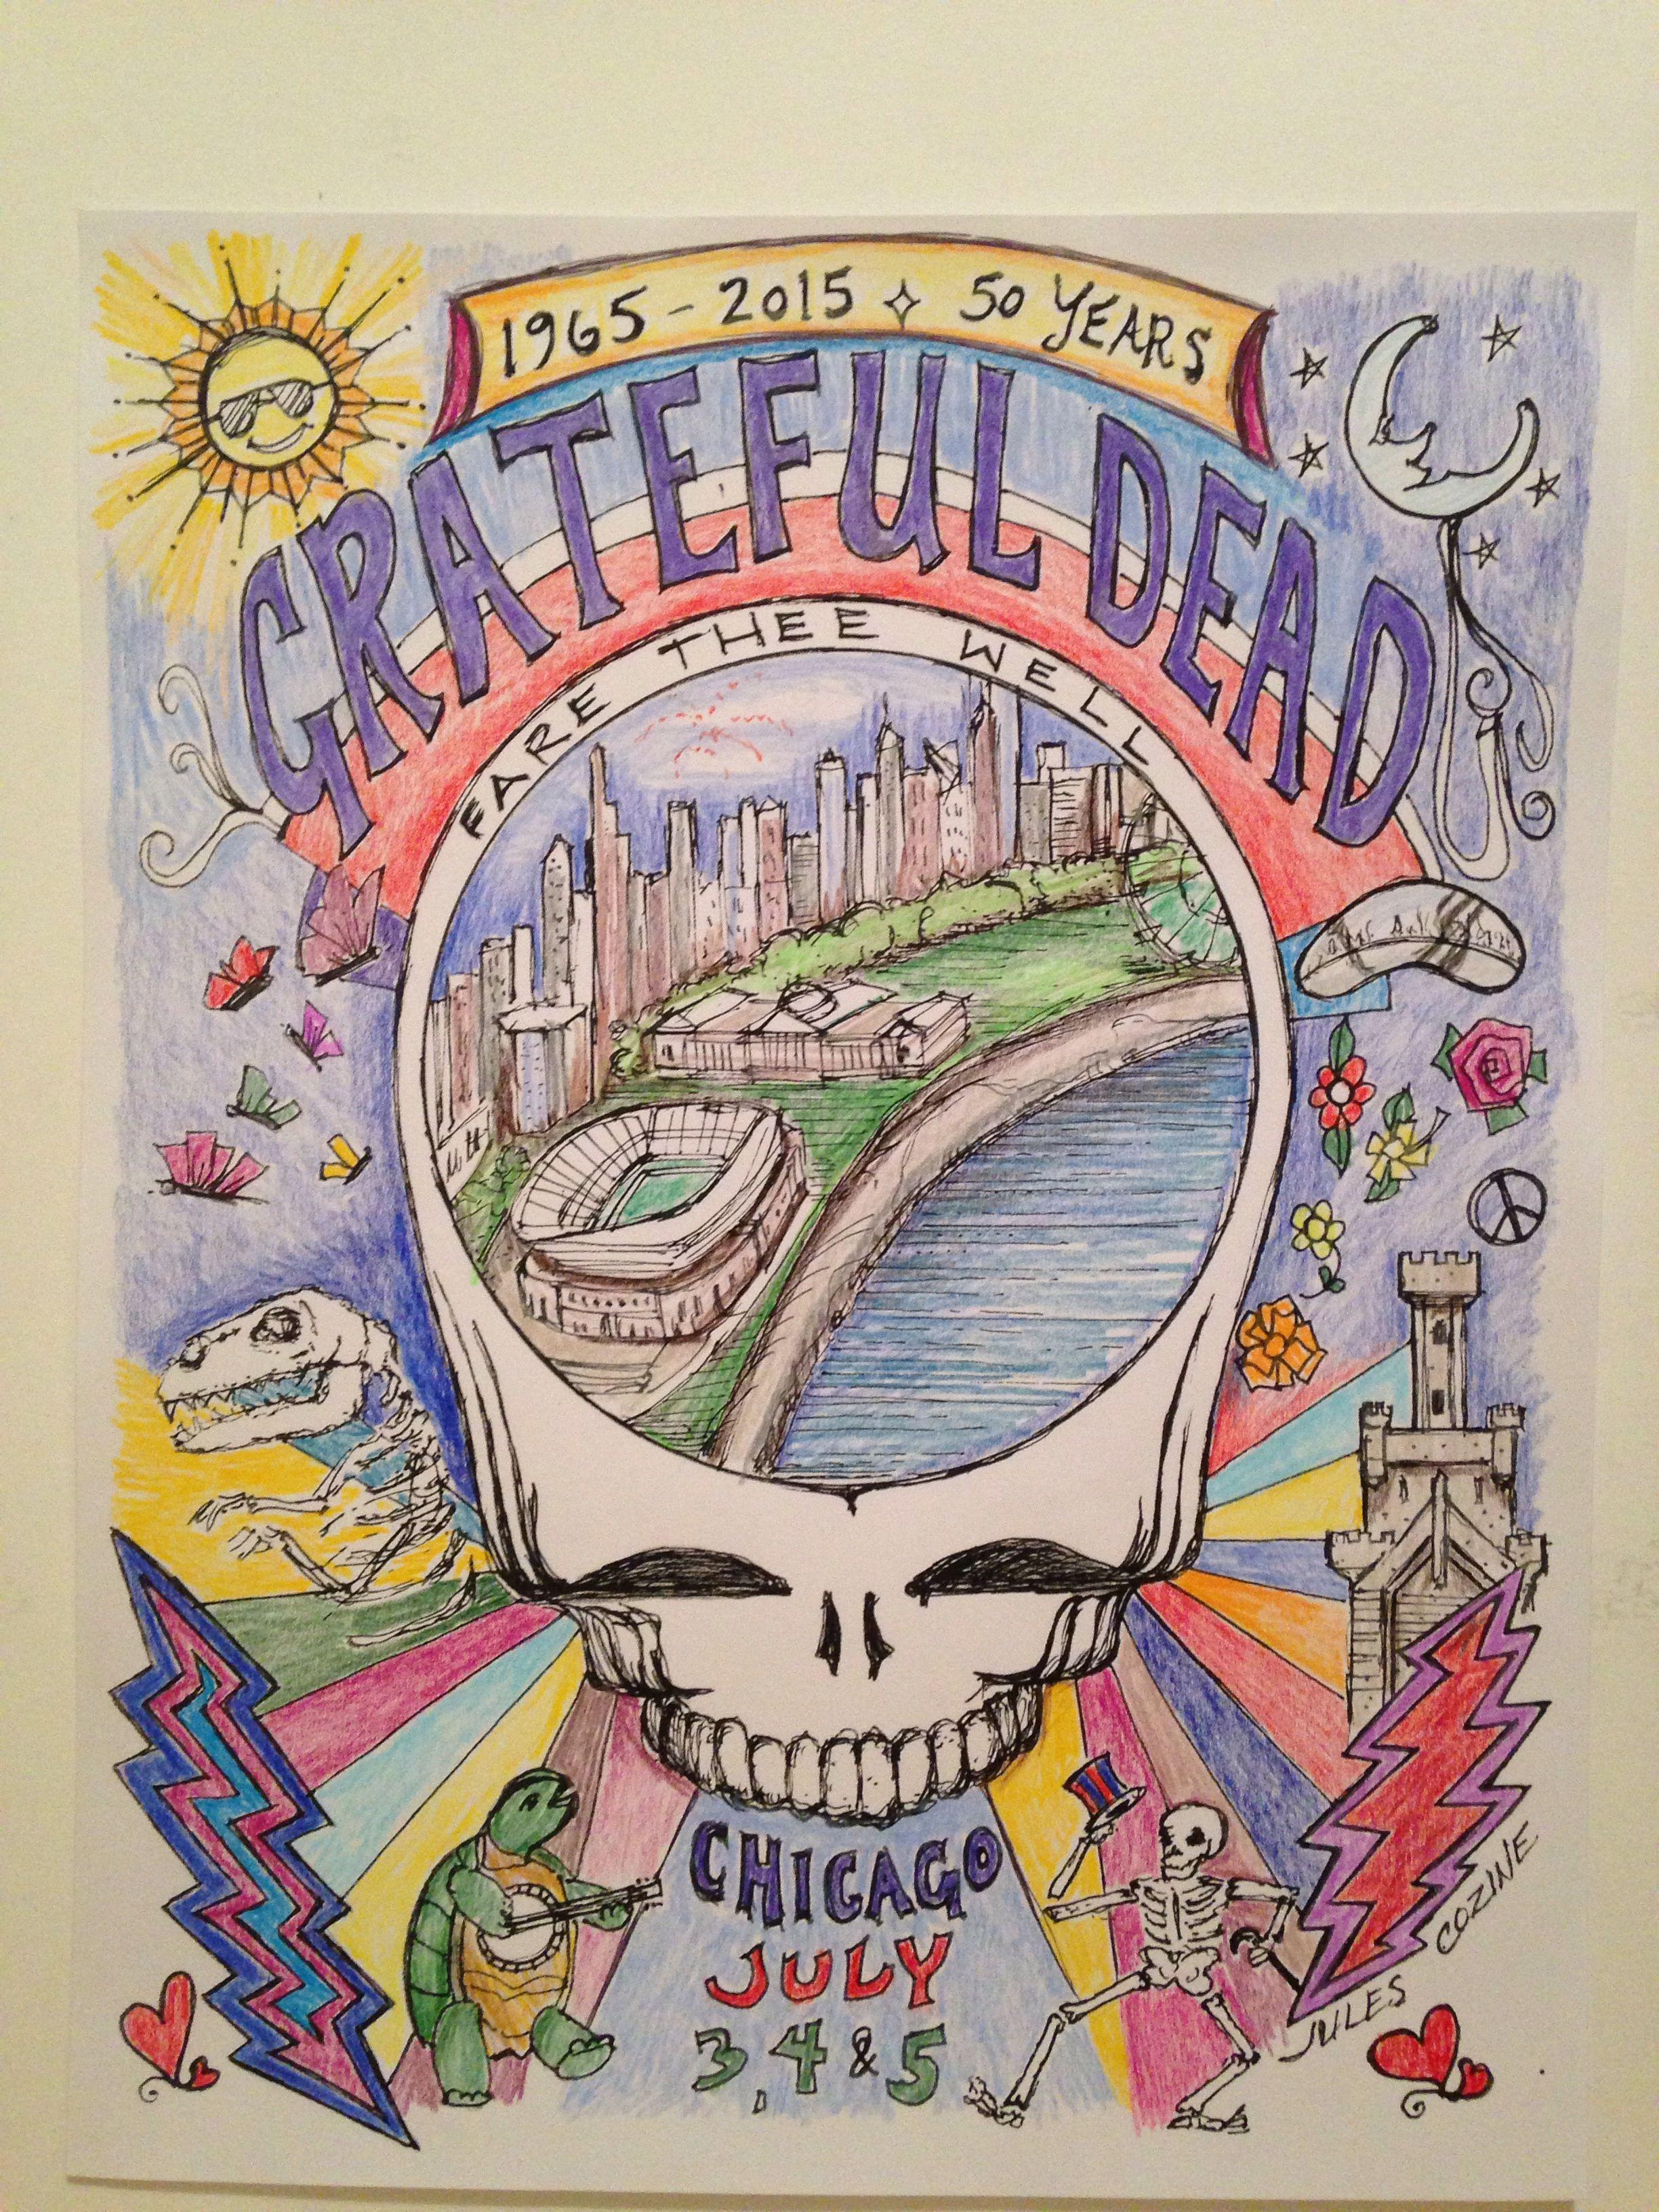 Grateful Dead music poster by Jules Cozine